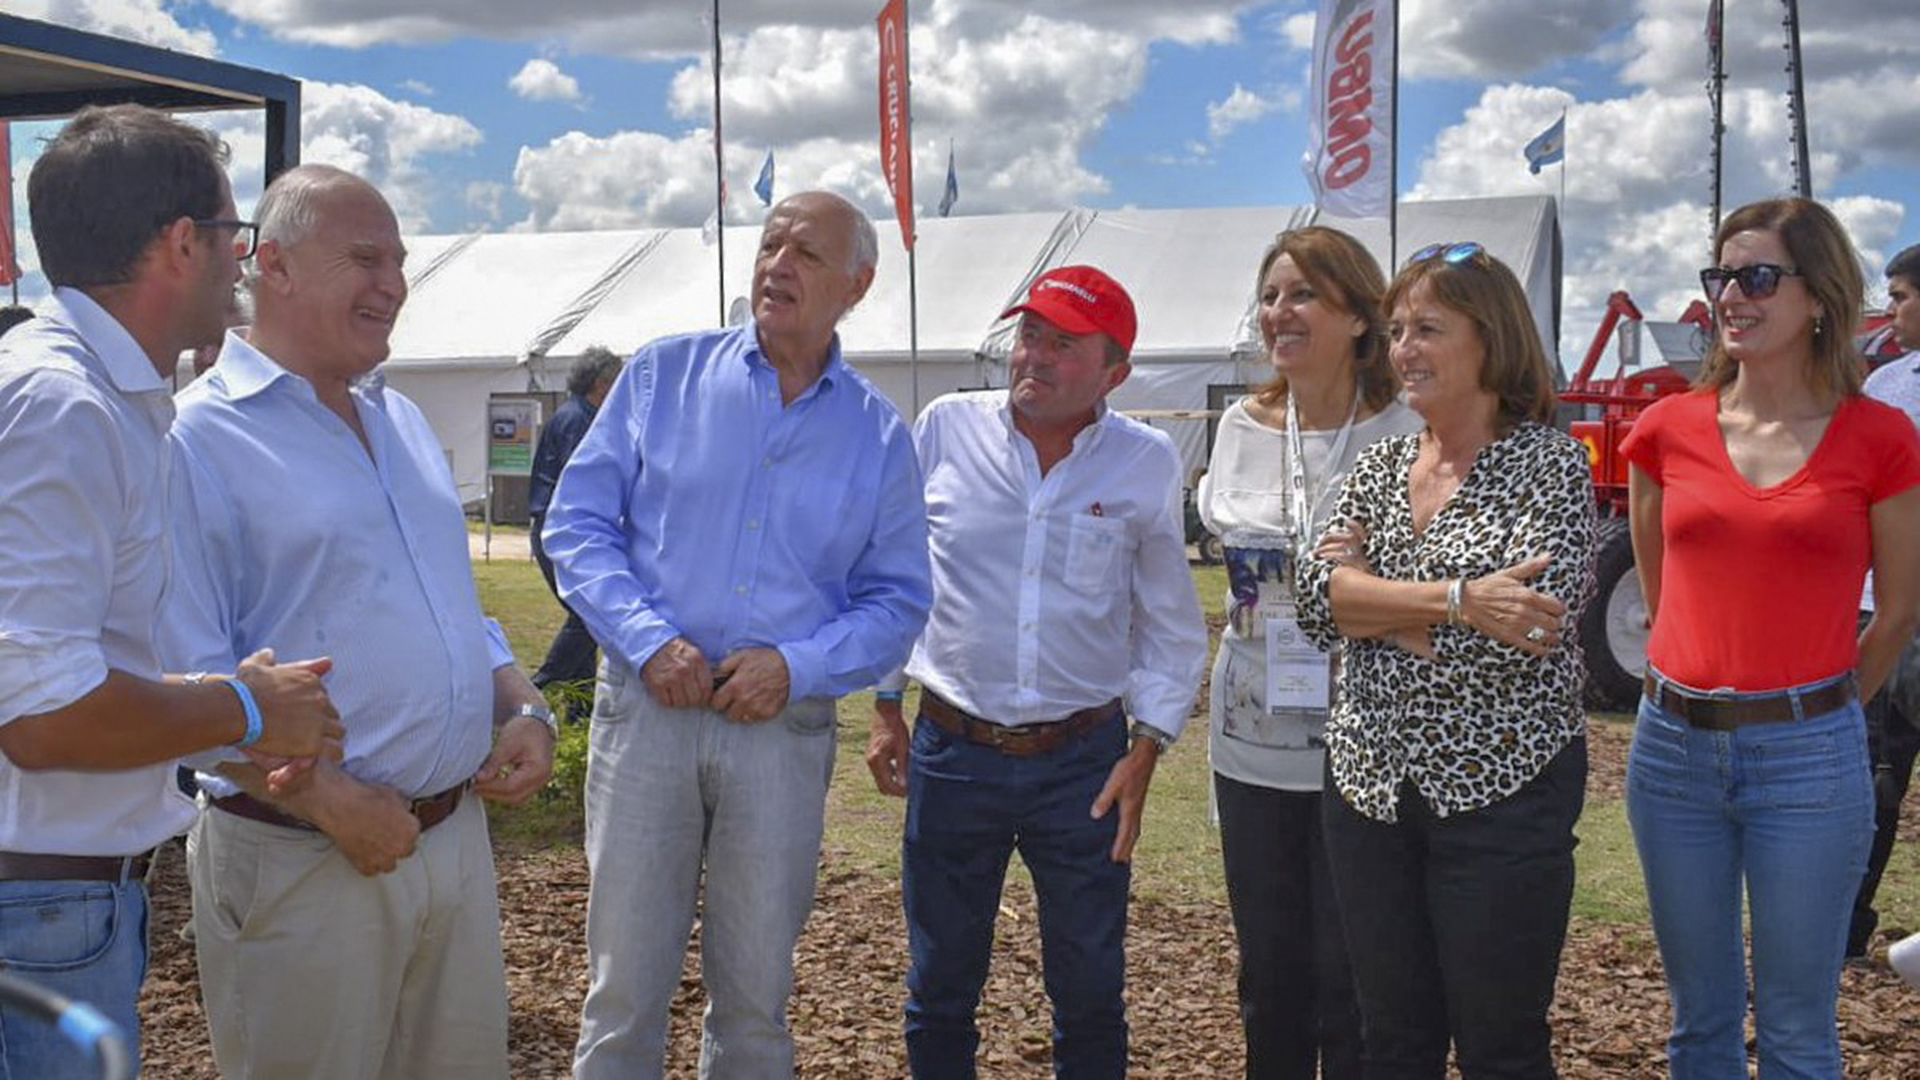 Roberto Lavagna y el gobernador Miguel Lifschitz esta semana en ExpoAgro (Foto: NA)